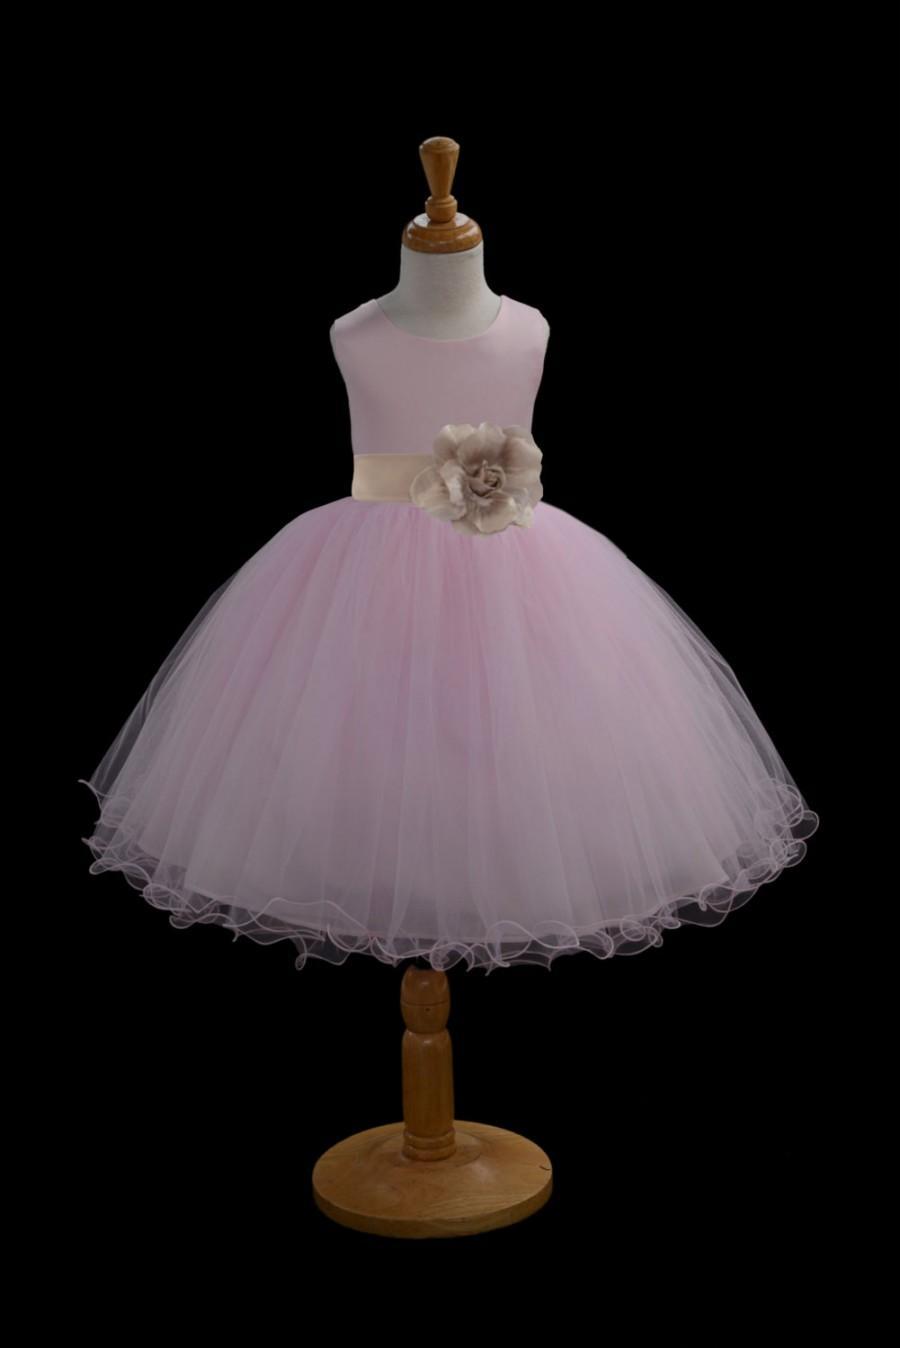 Свадьба - Pink Flower Girl dress tie sash pageant wedding bridal recital children tulle bridesmaid toddler 37 sashes sizes 12-18m 2 4 6 8 10 12